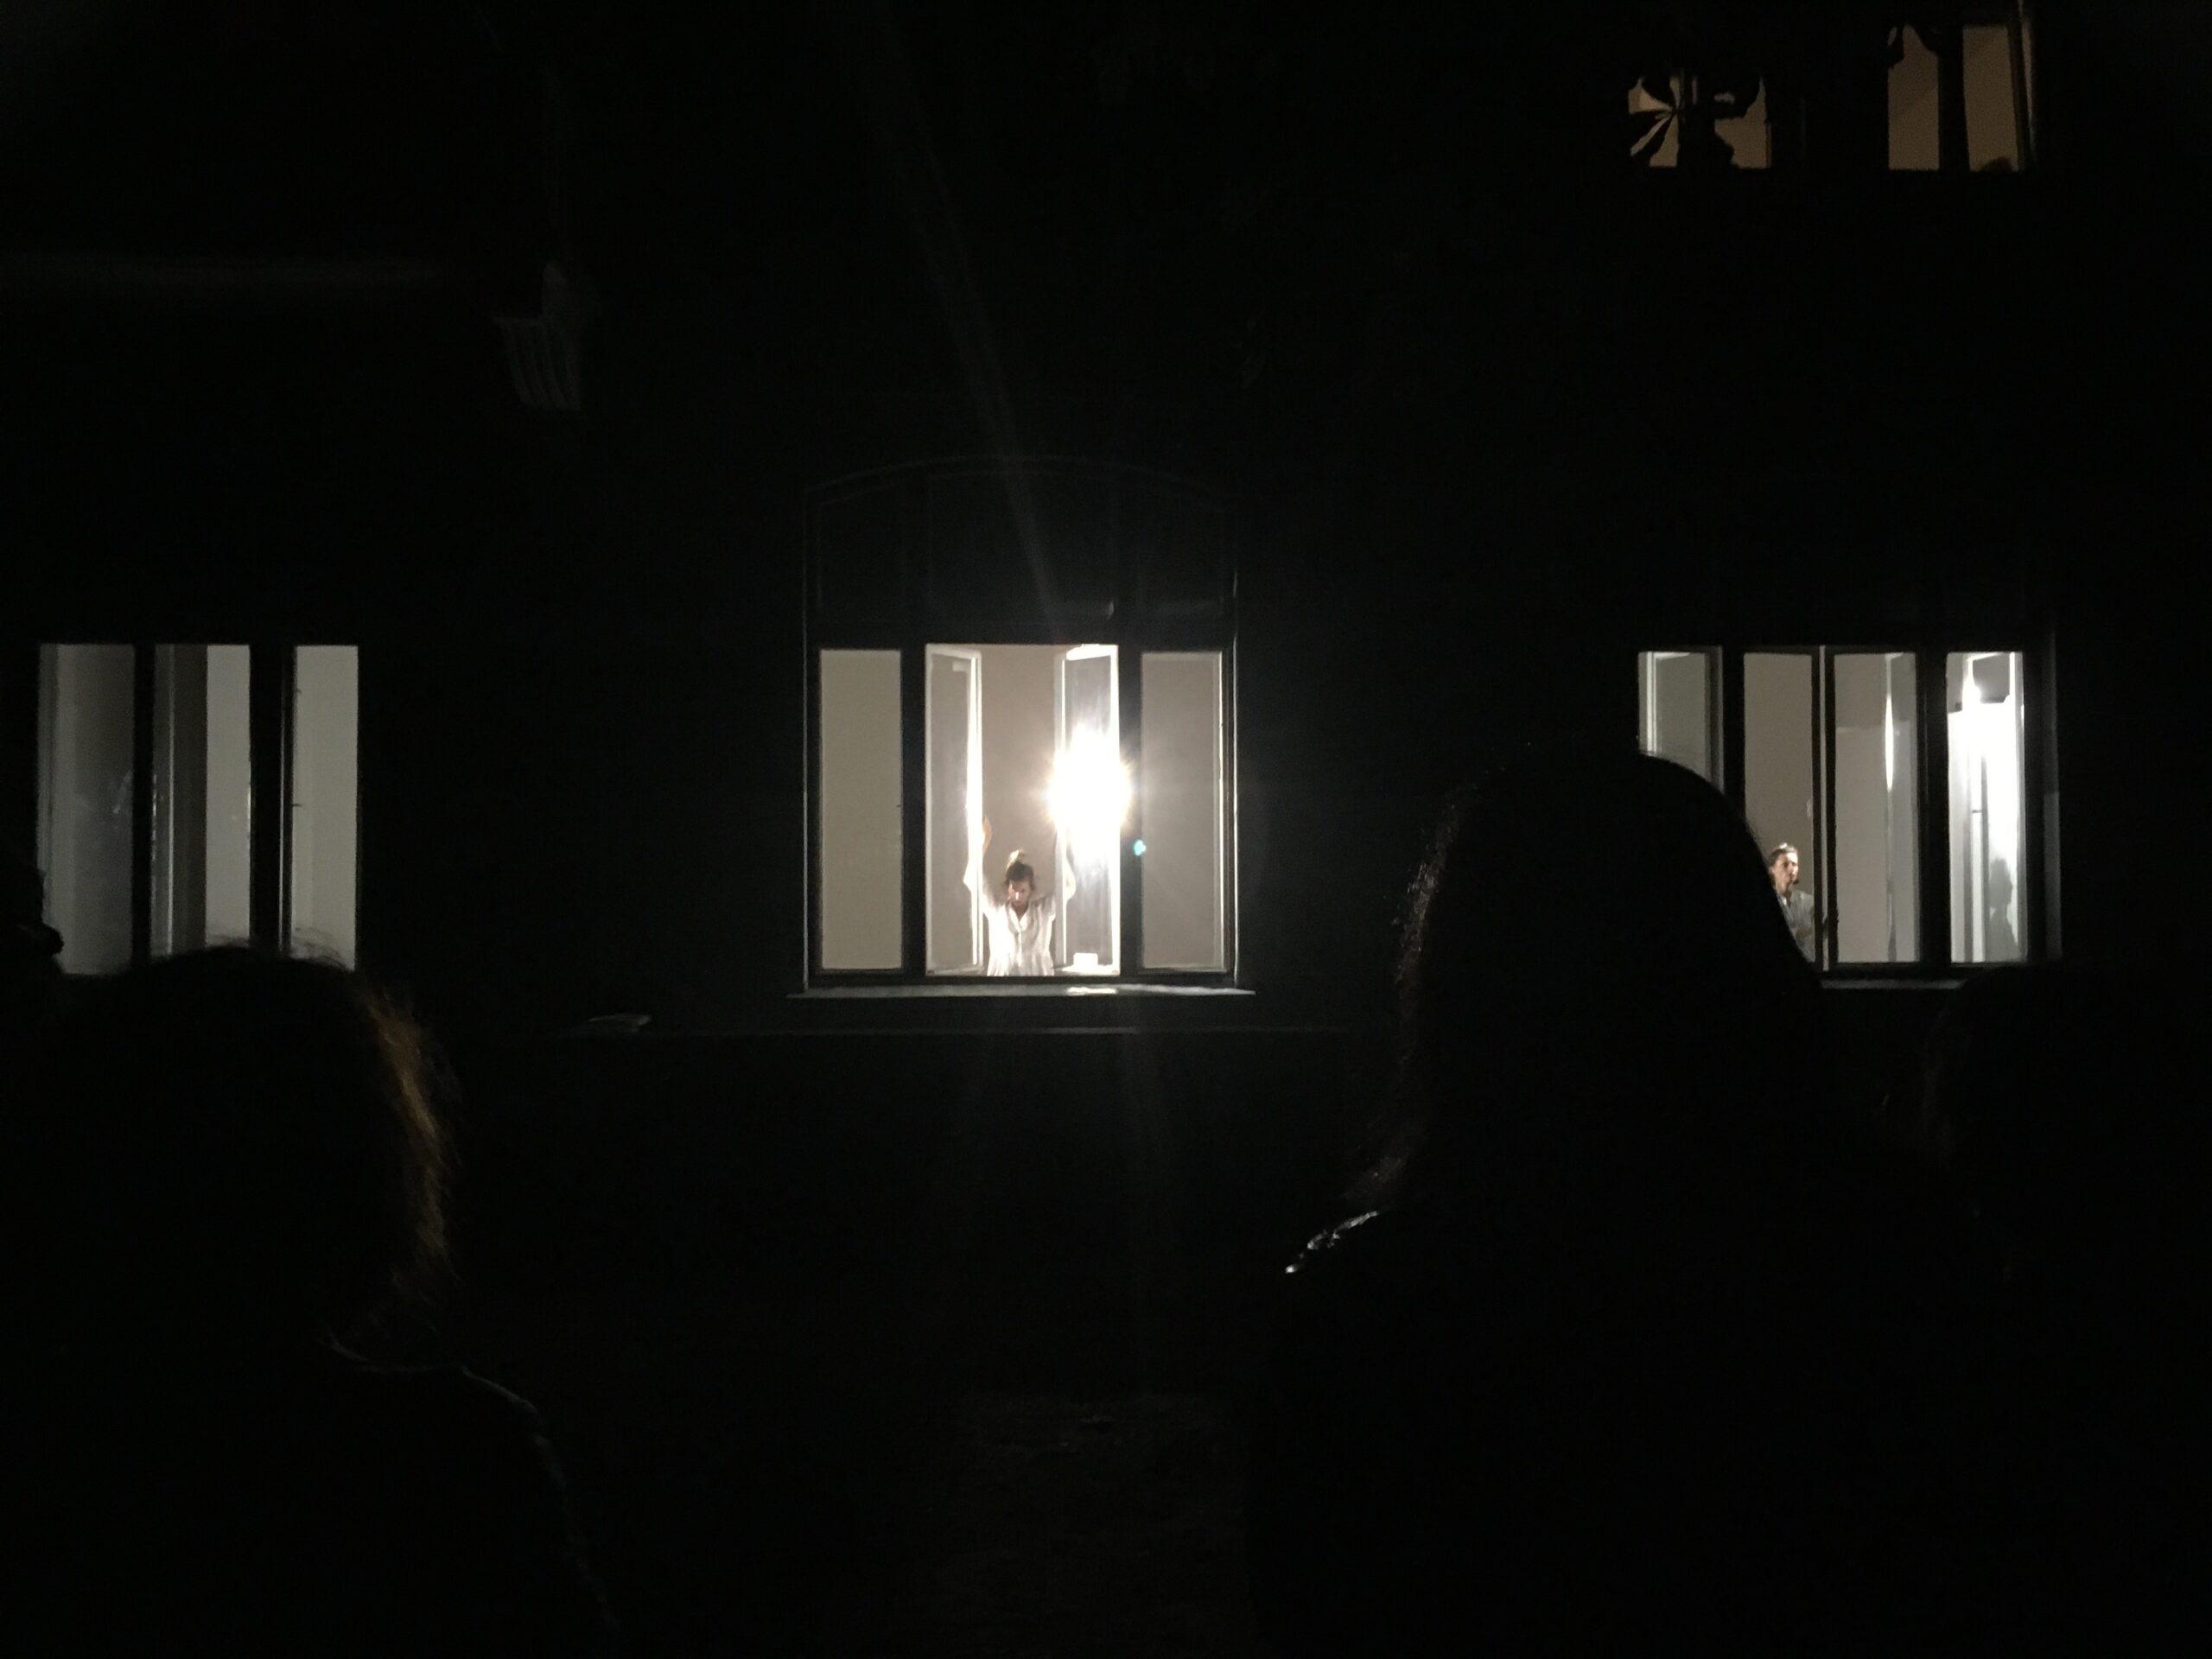 Rear Window – Dancers Without Answers by Rebeka Kunej